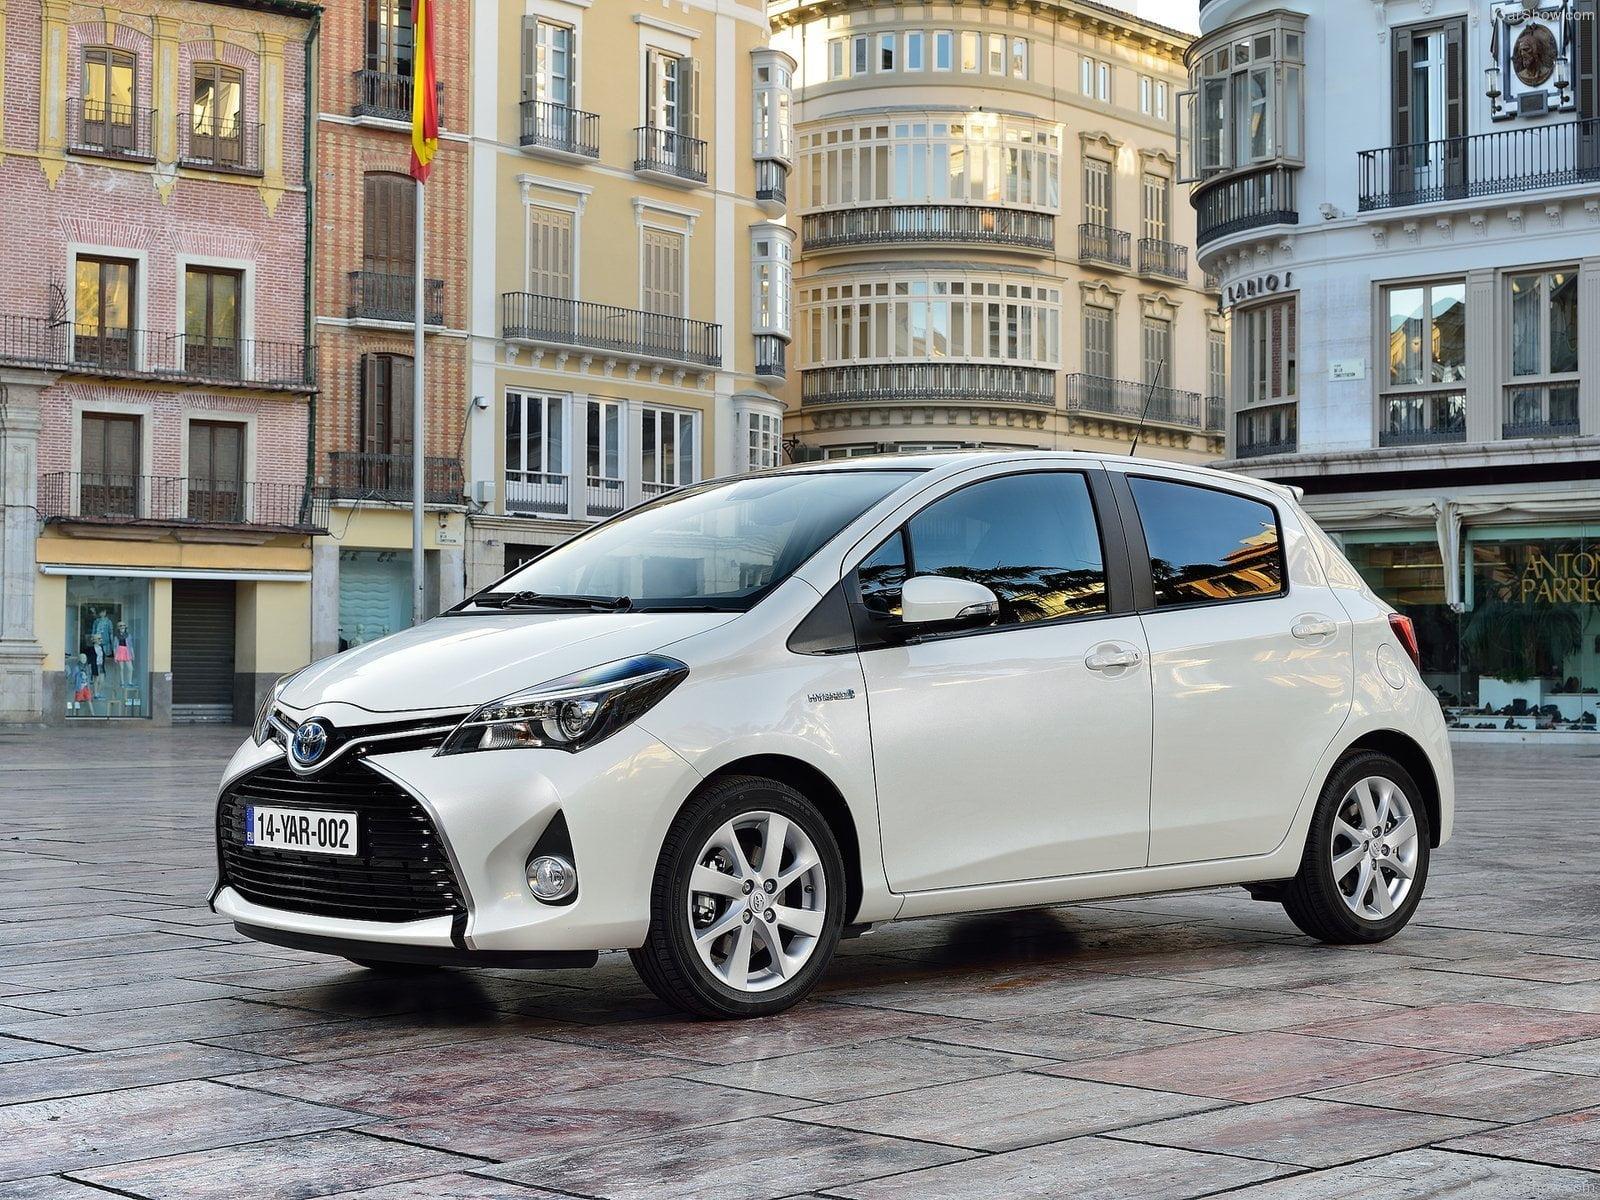 100 Best Selling Cars in Europe